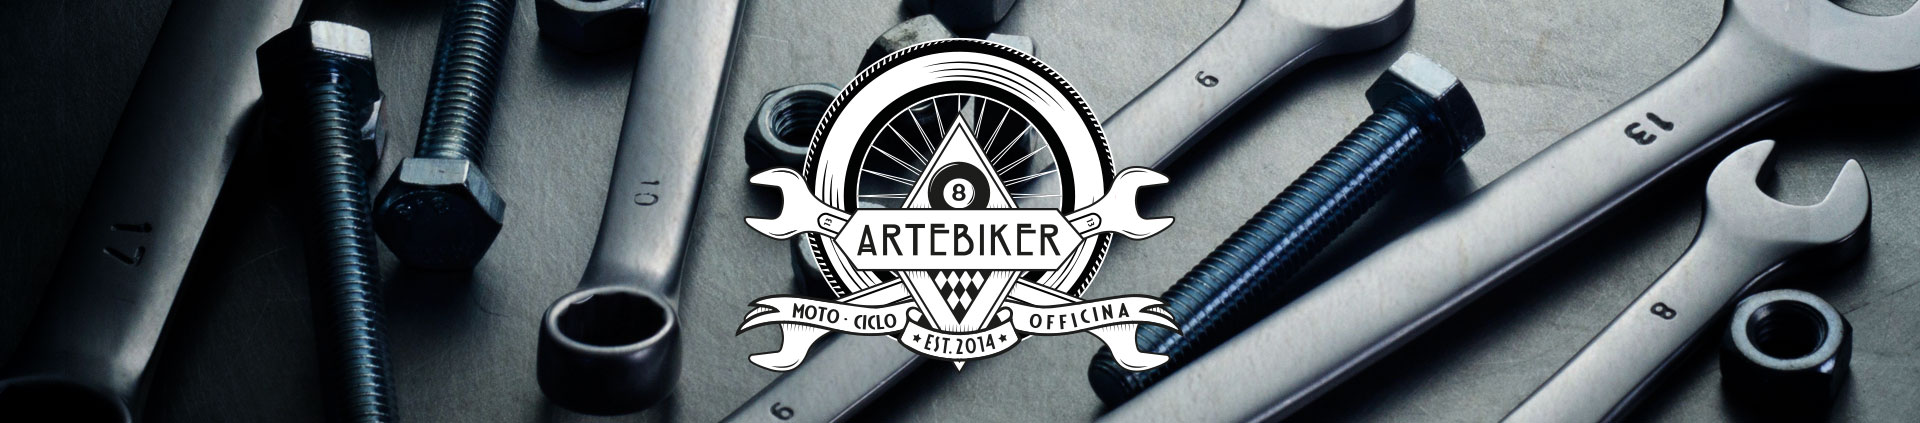 ARTEBIKER_LOGO